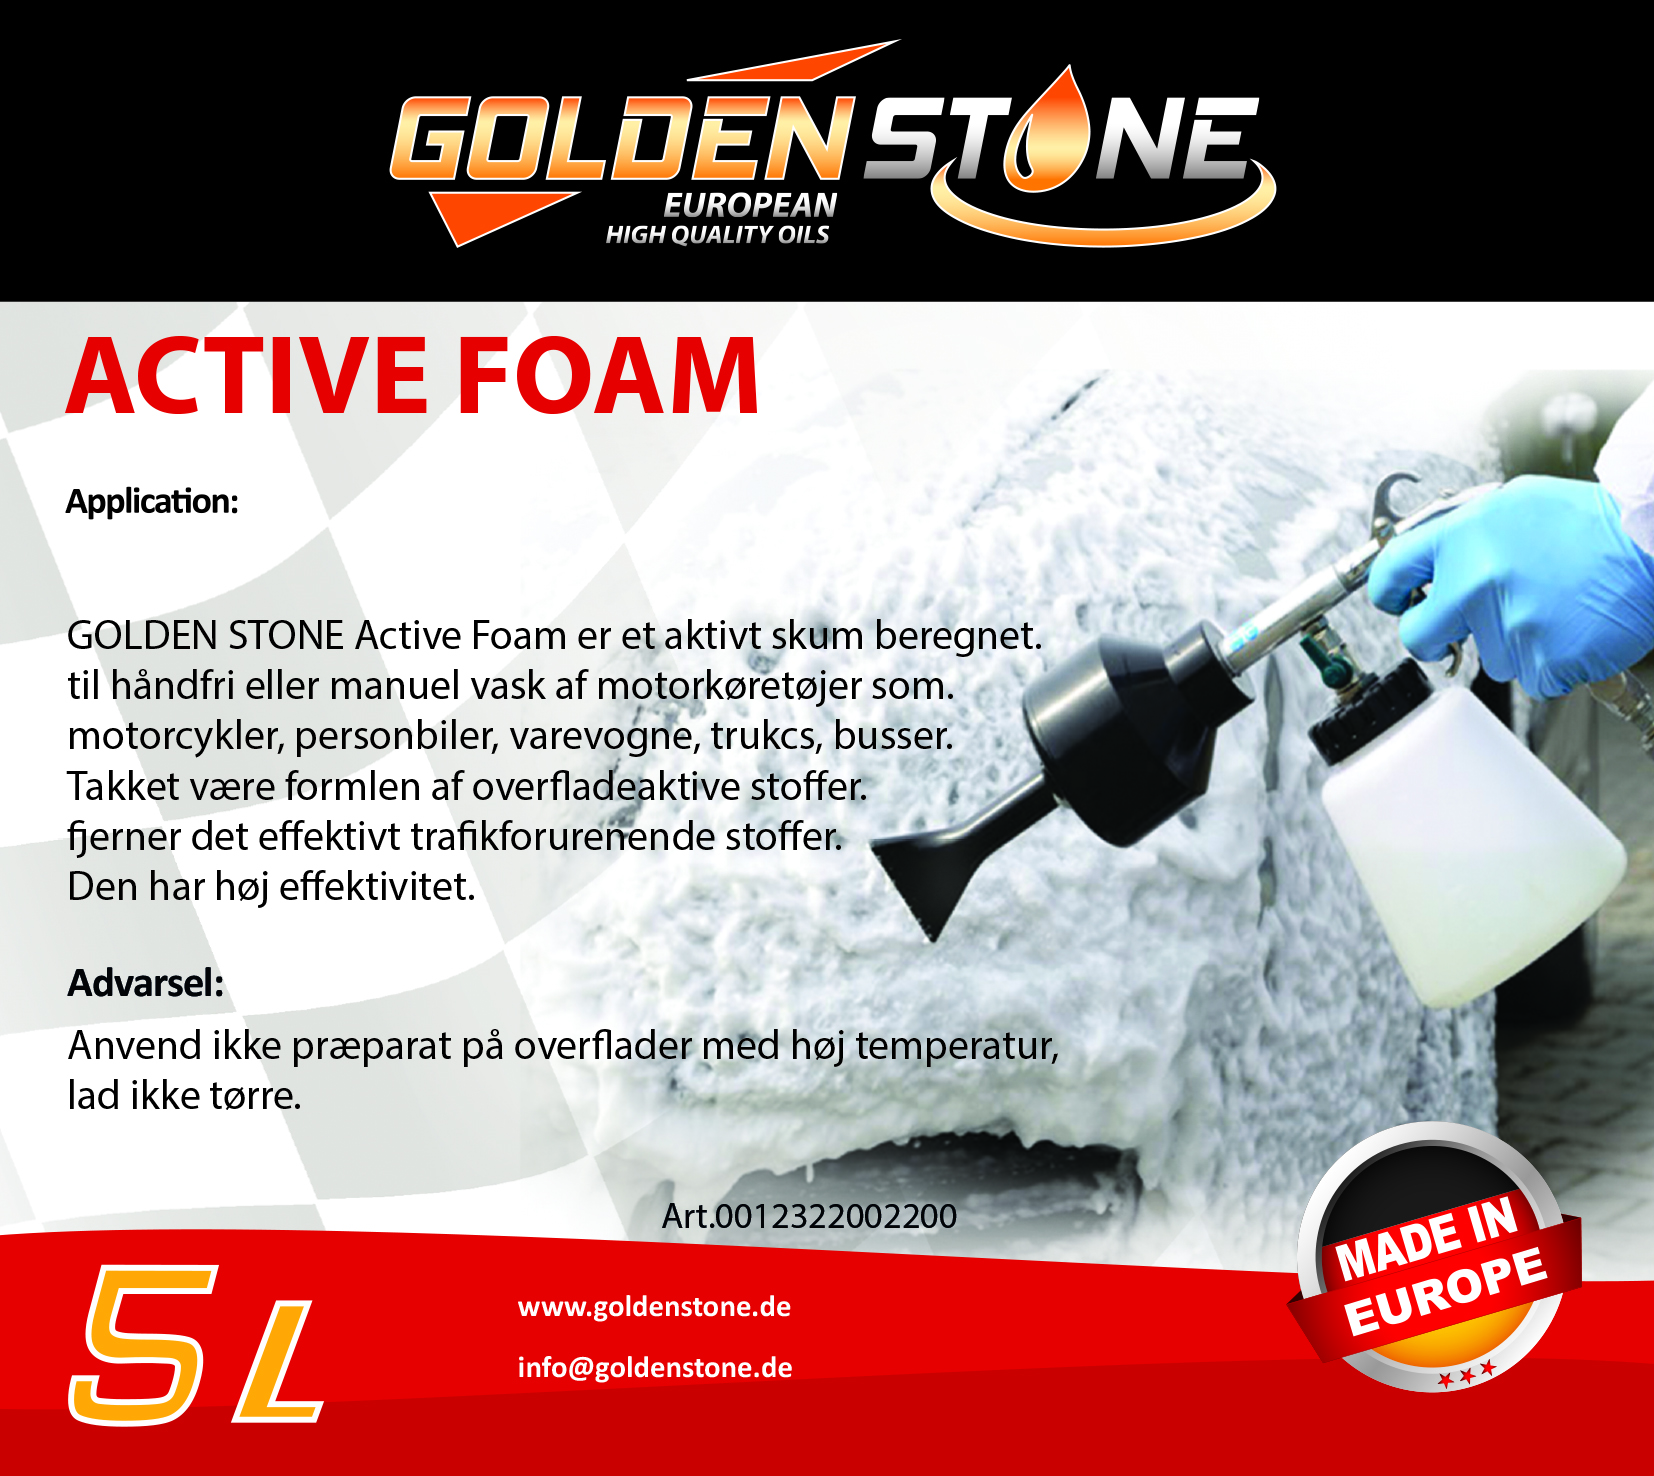 Goldenstone autoshampoo til skumlanse - Snow Foam Shampoo 5l.